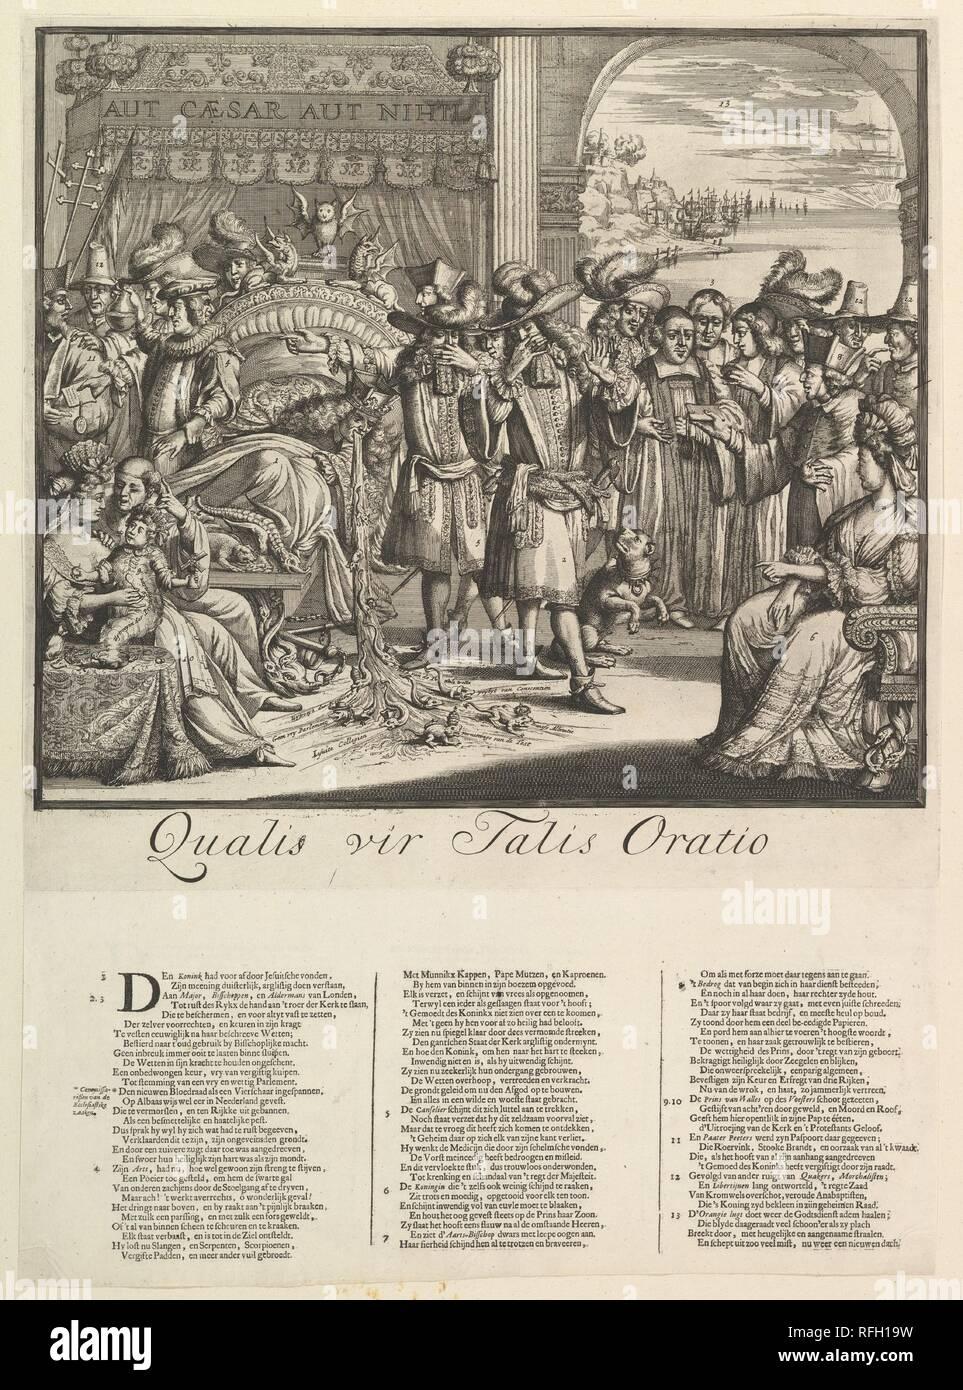 Qualis vir Talis Oratio. Artist: Romeyn de Hooghe (Dutch, Amsterdam 1645-1708 Haarlem). Dimensions: sheet: 21 1/4 x 15 1/2 in. (54 x 39.4 cm). Date: n.d.. Museum: Metropolitan Museum of Art, New York, USA. - Stock Image